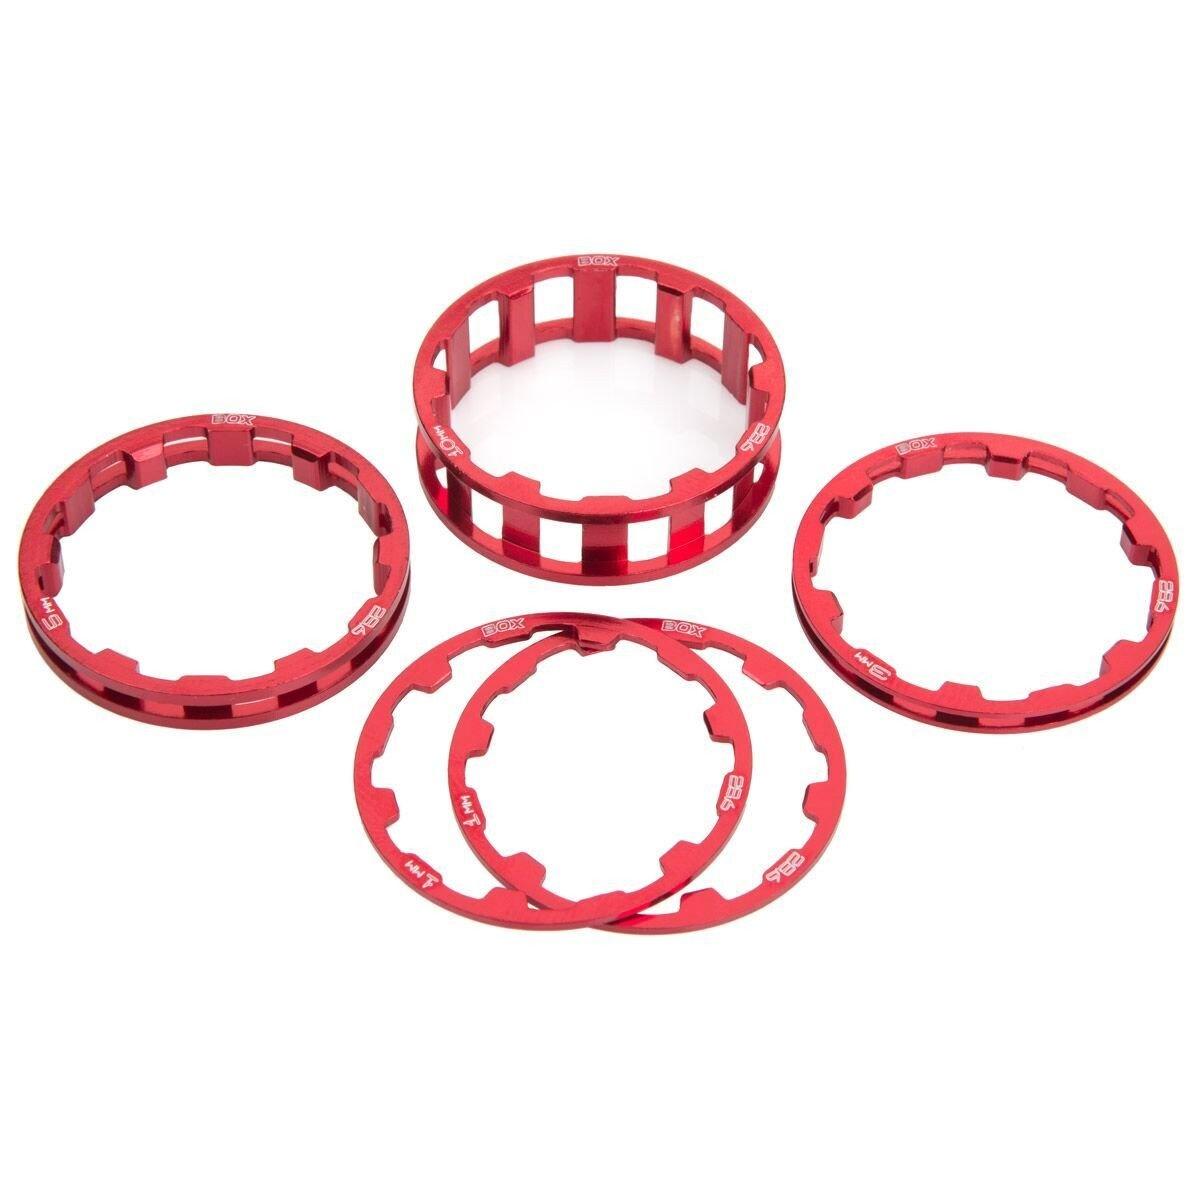 Box Zero Headset Spacer Kit - 1-1/8'' - Red-1